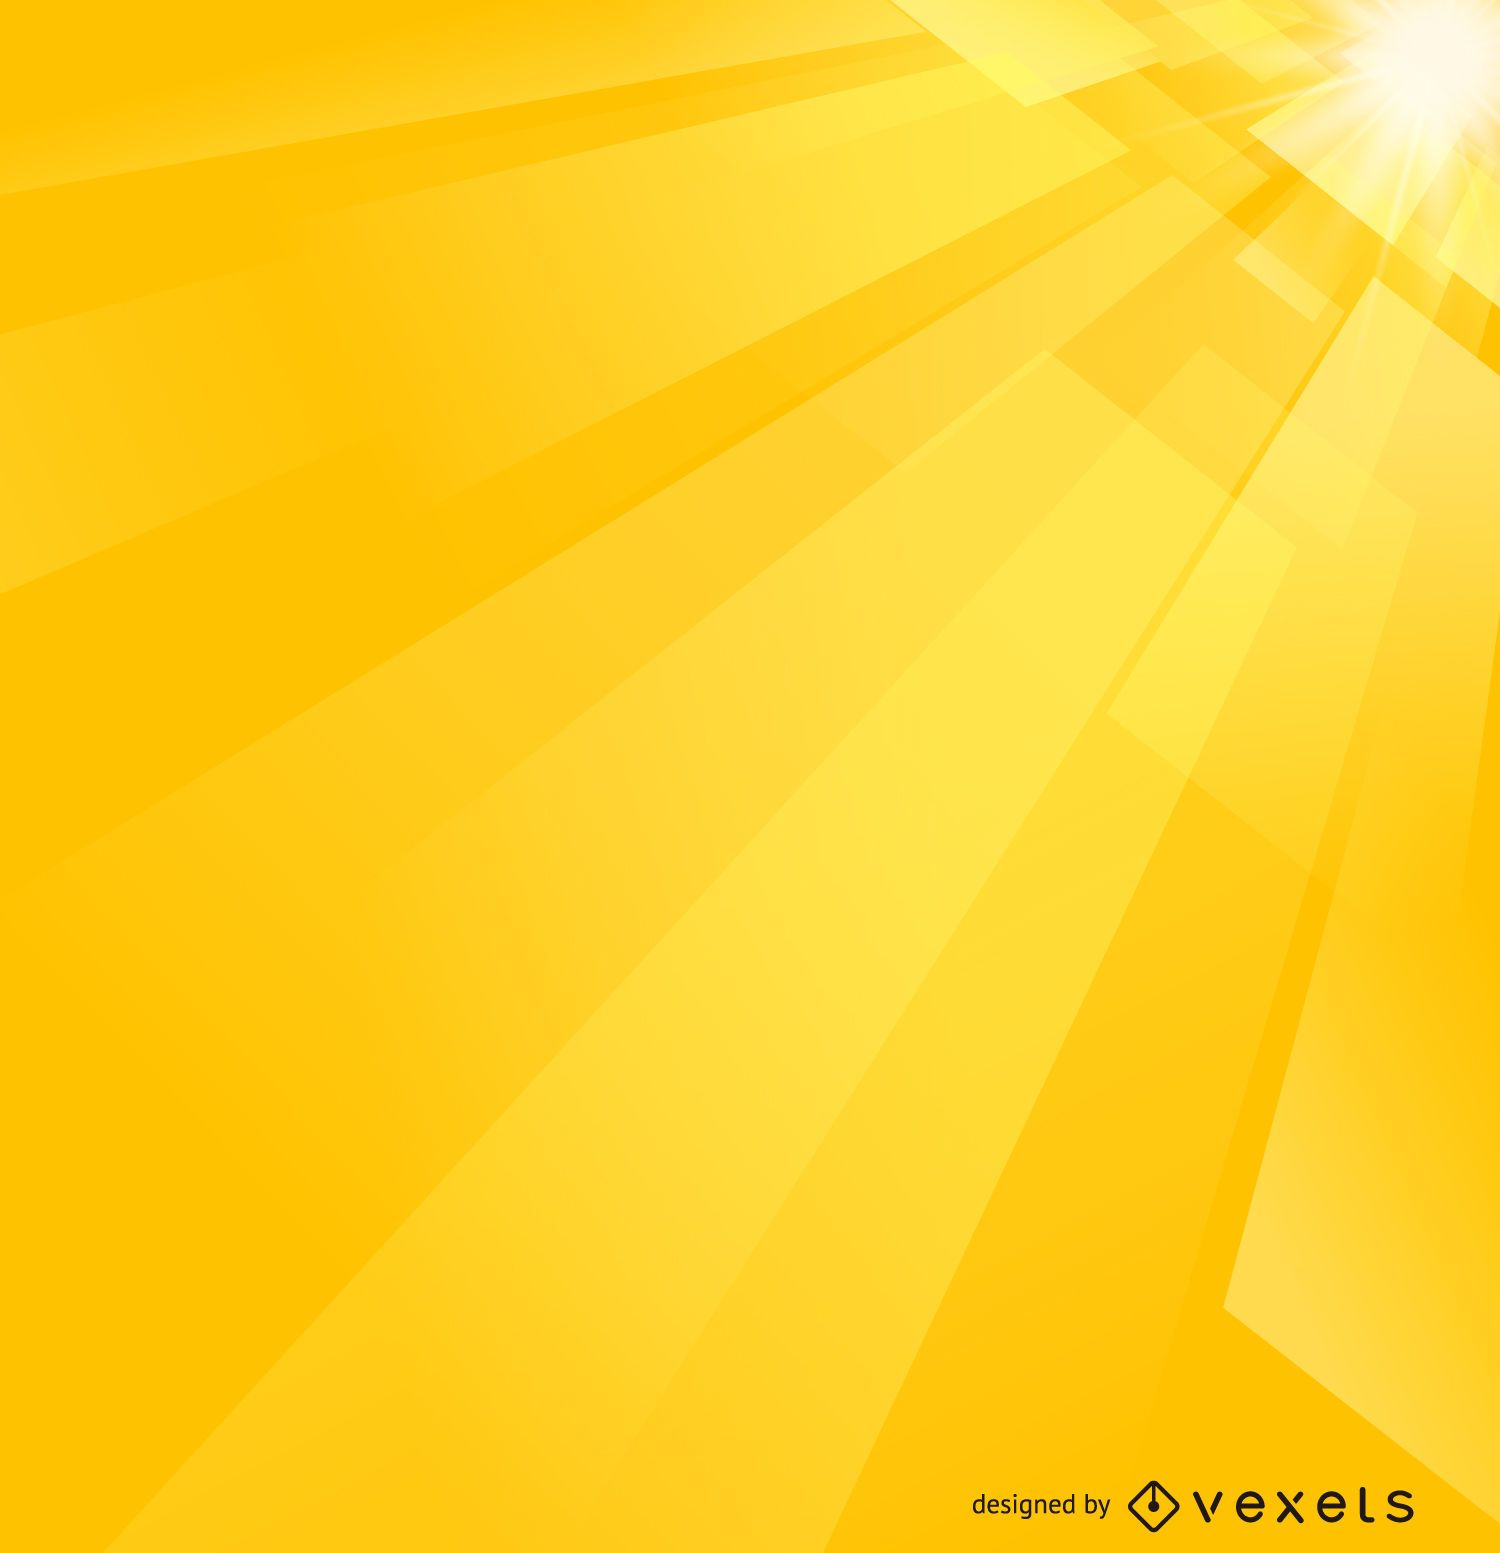 Fondo futurista abstracto amarillo descargar vector image user altavistaventures Choice Image